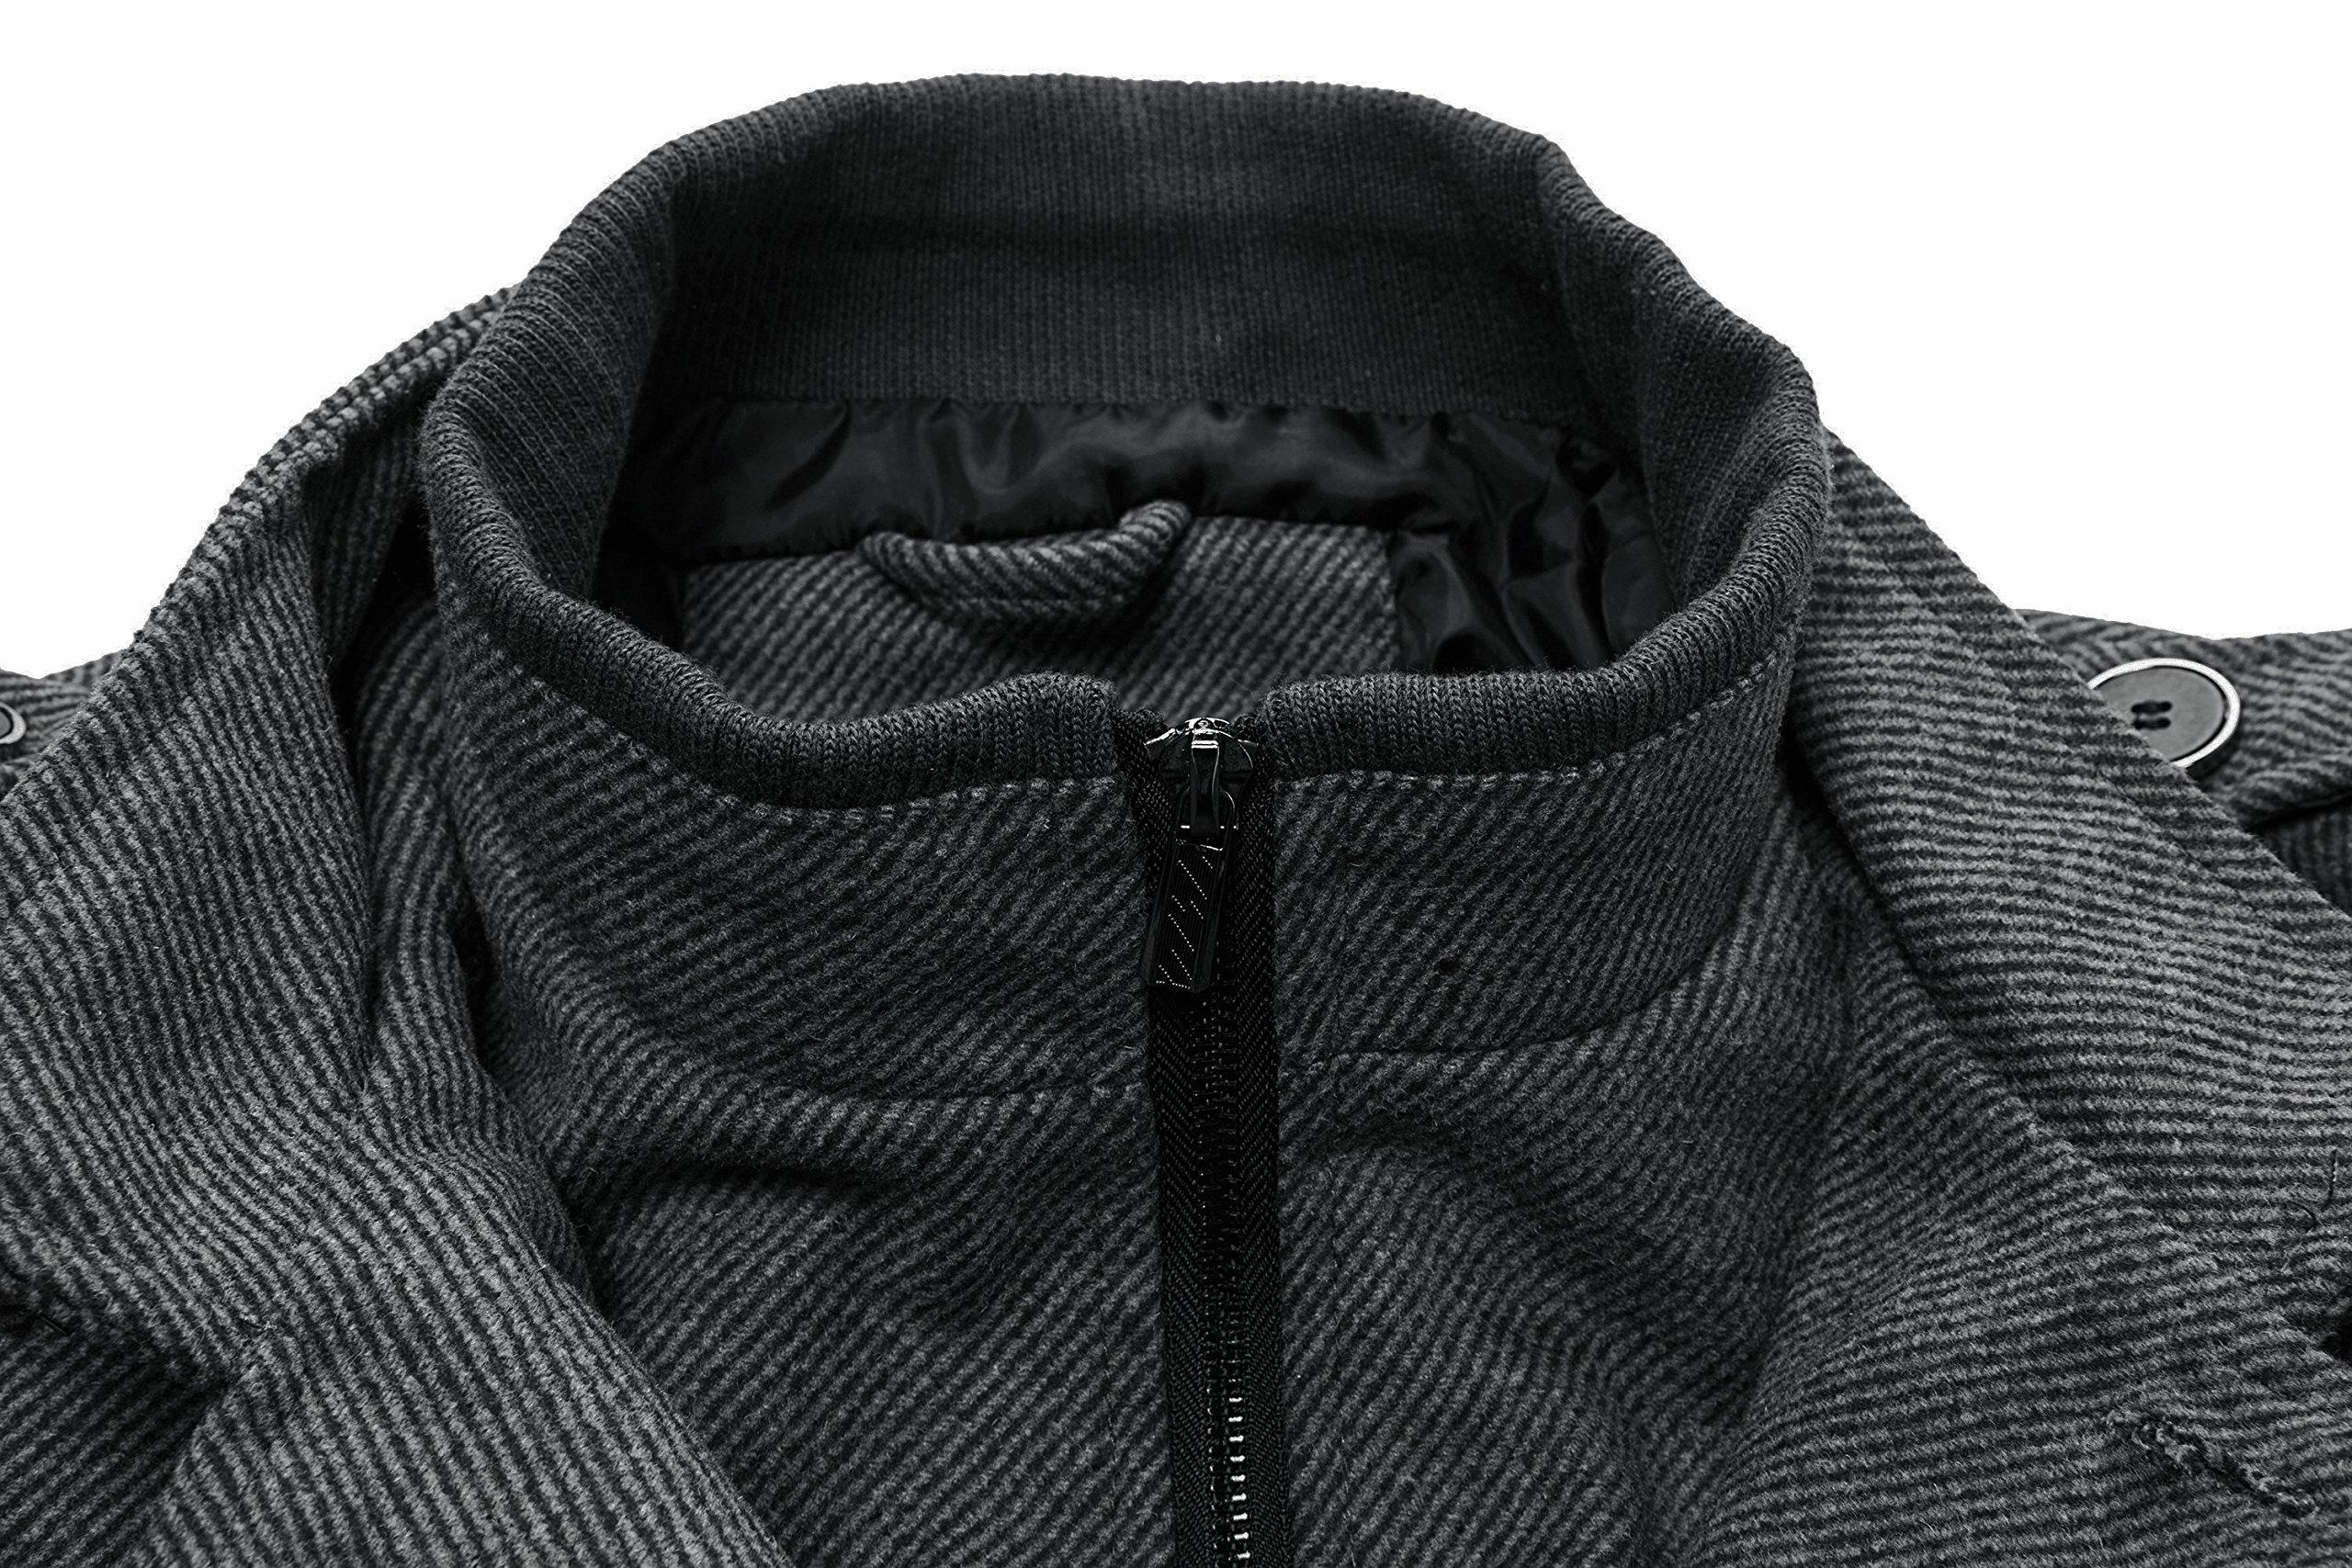 Wantdo Men's Wool Coat Stand Collar Windproof Jacket Overcoat Grey Large by Wantdo (Image #4)